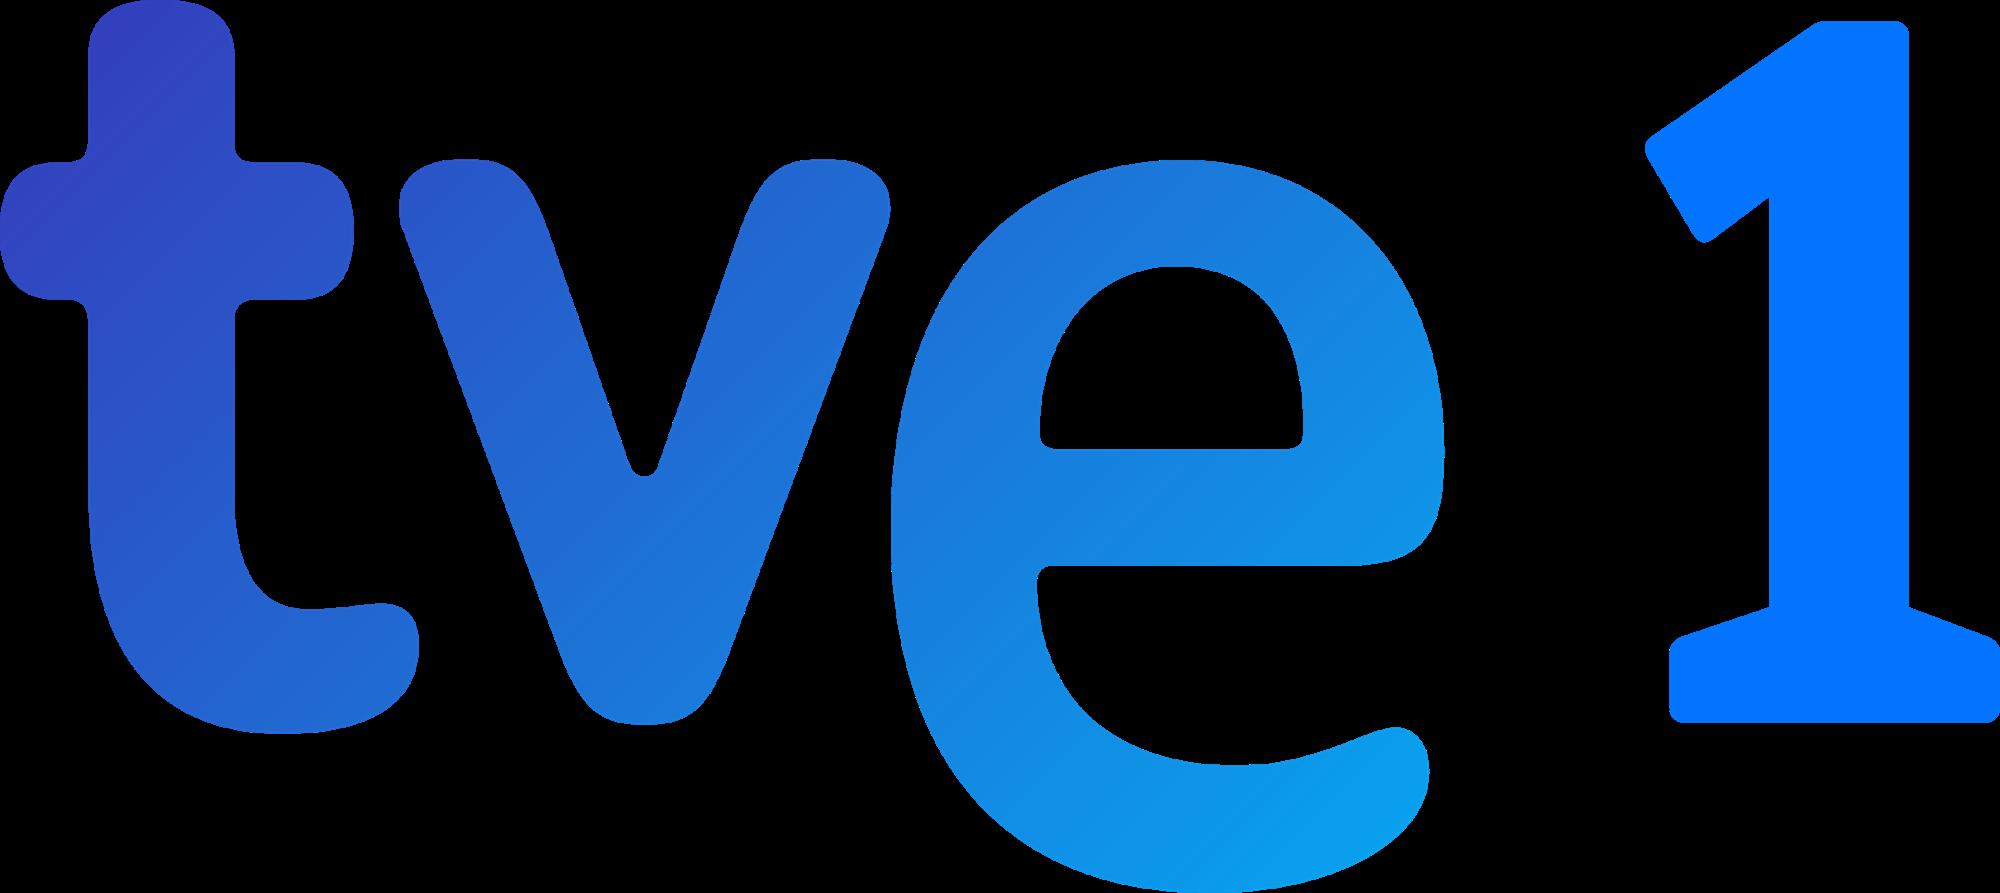 Archivo:TVE1 logo 2008.png